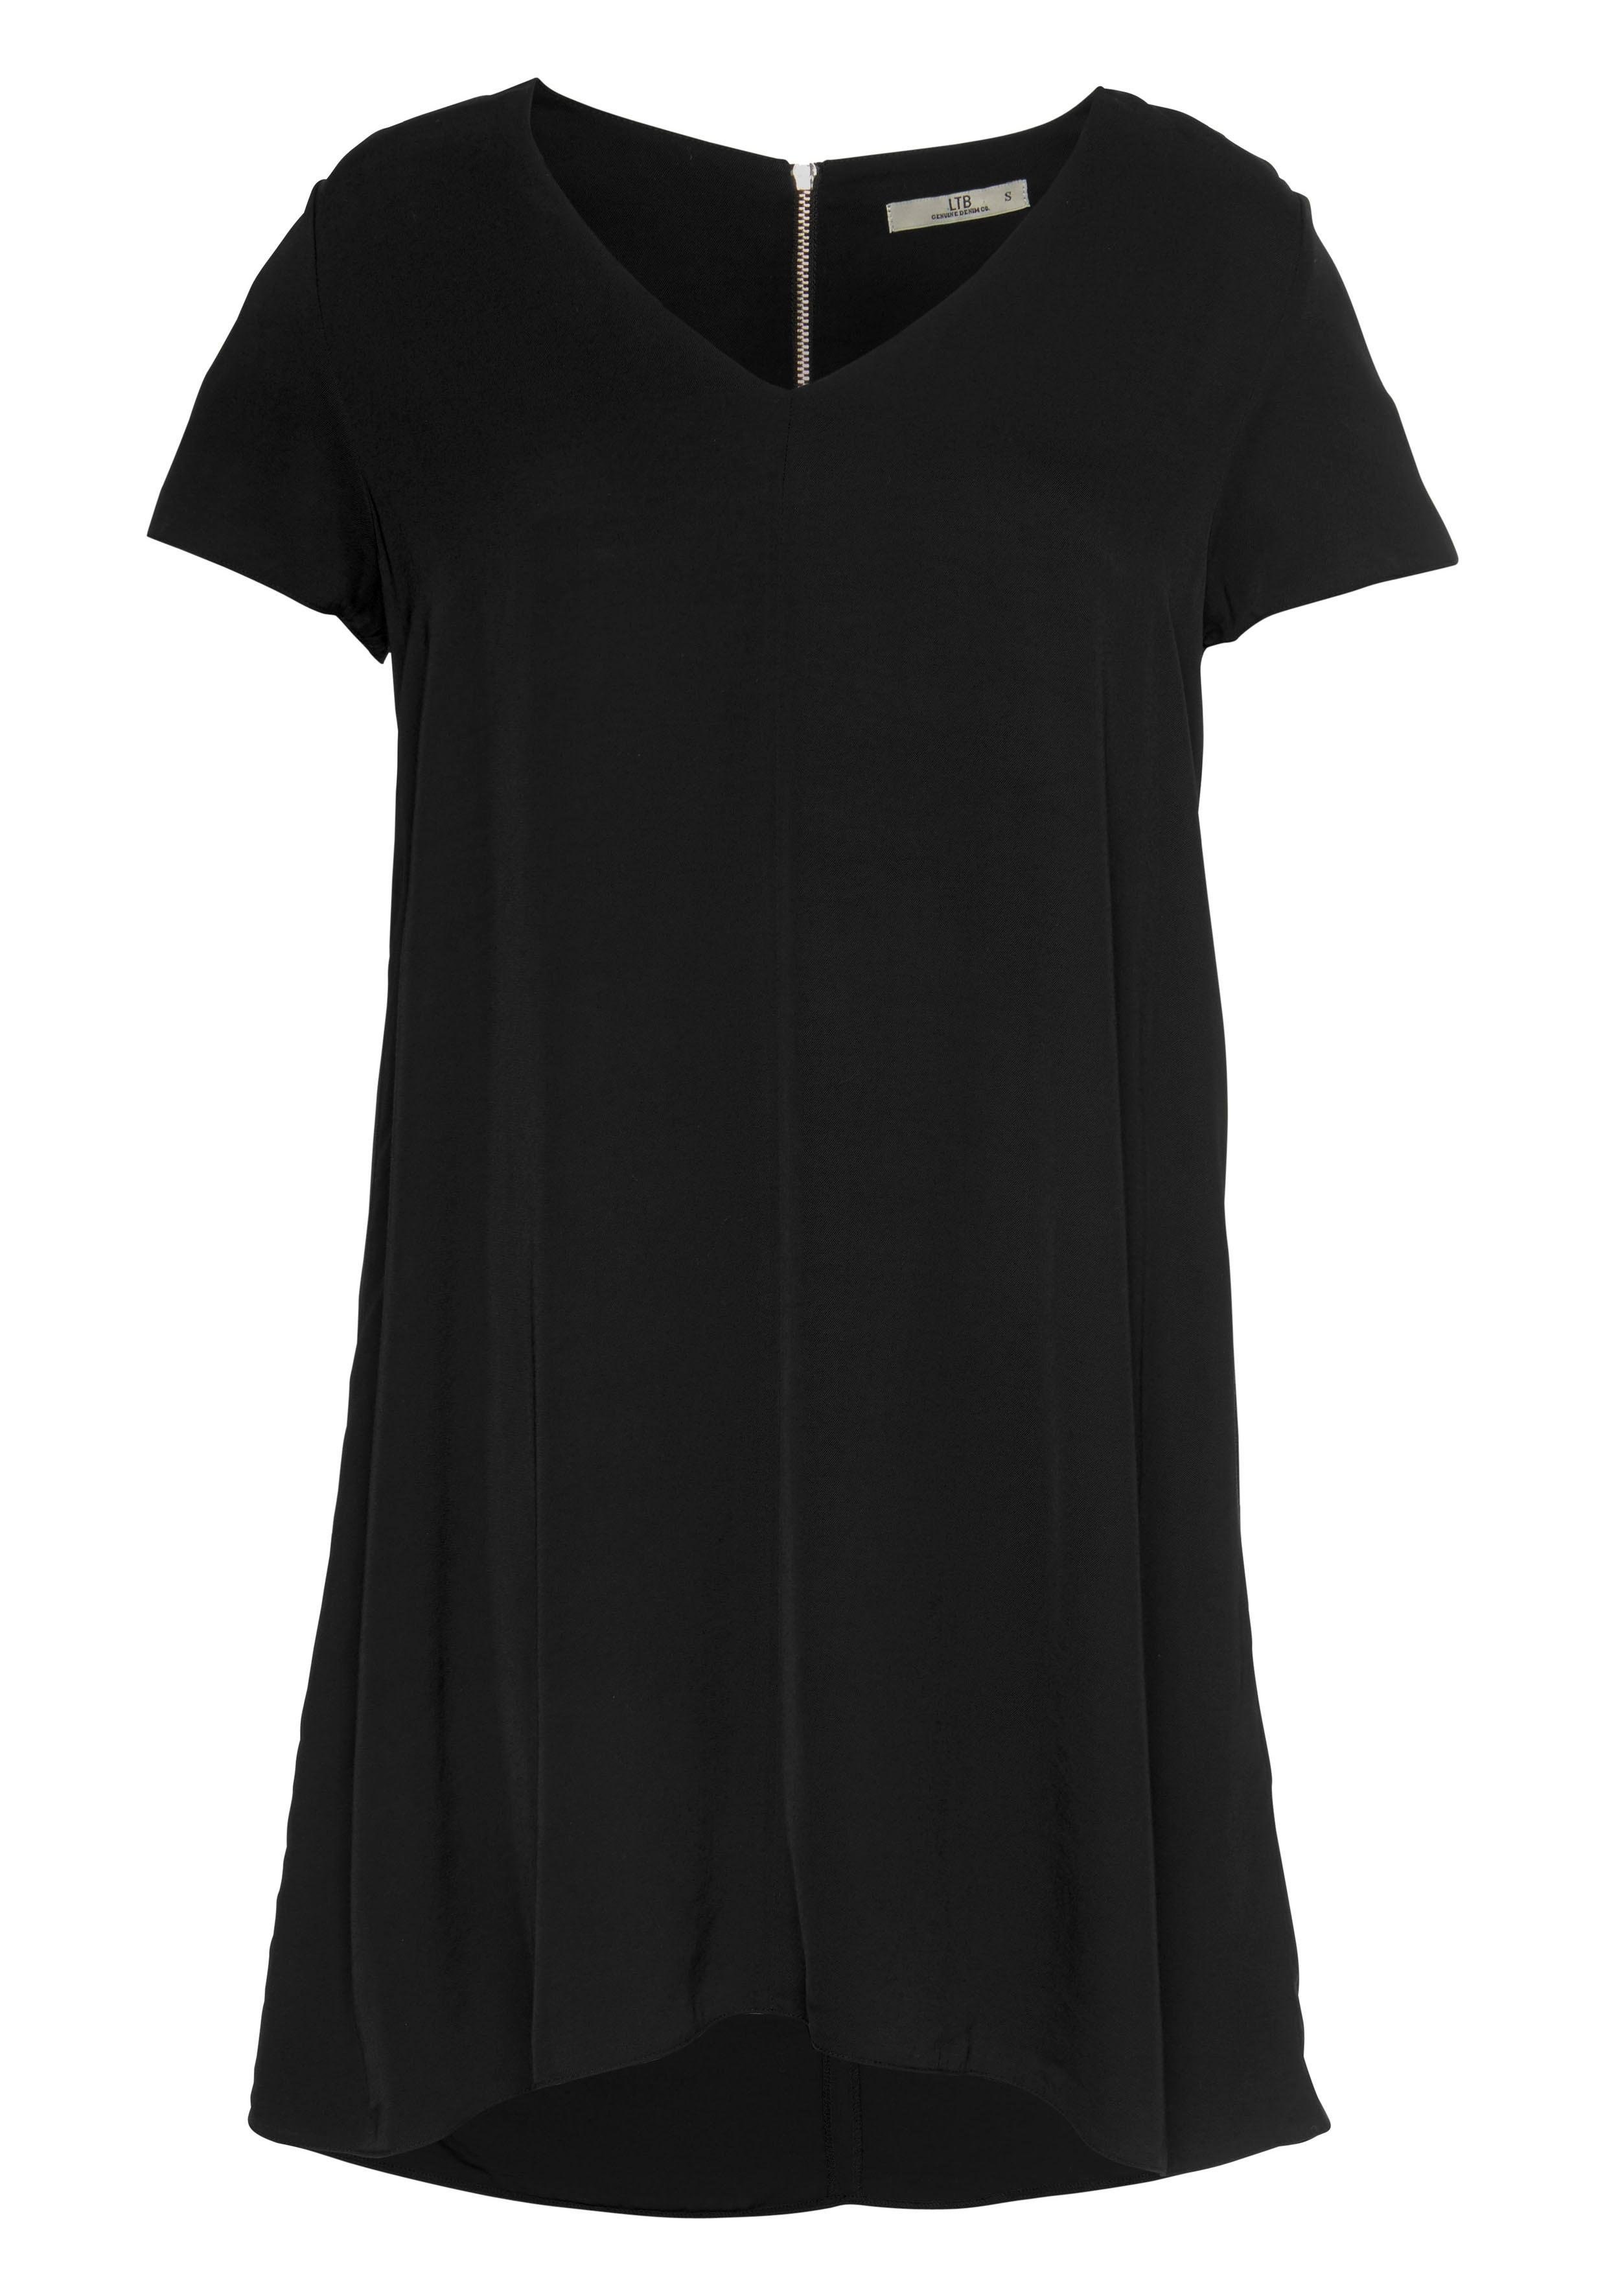 LTB jurk in a-lijn »WIKOCO« veilig op otto.nl kopen